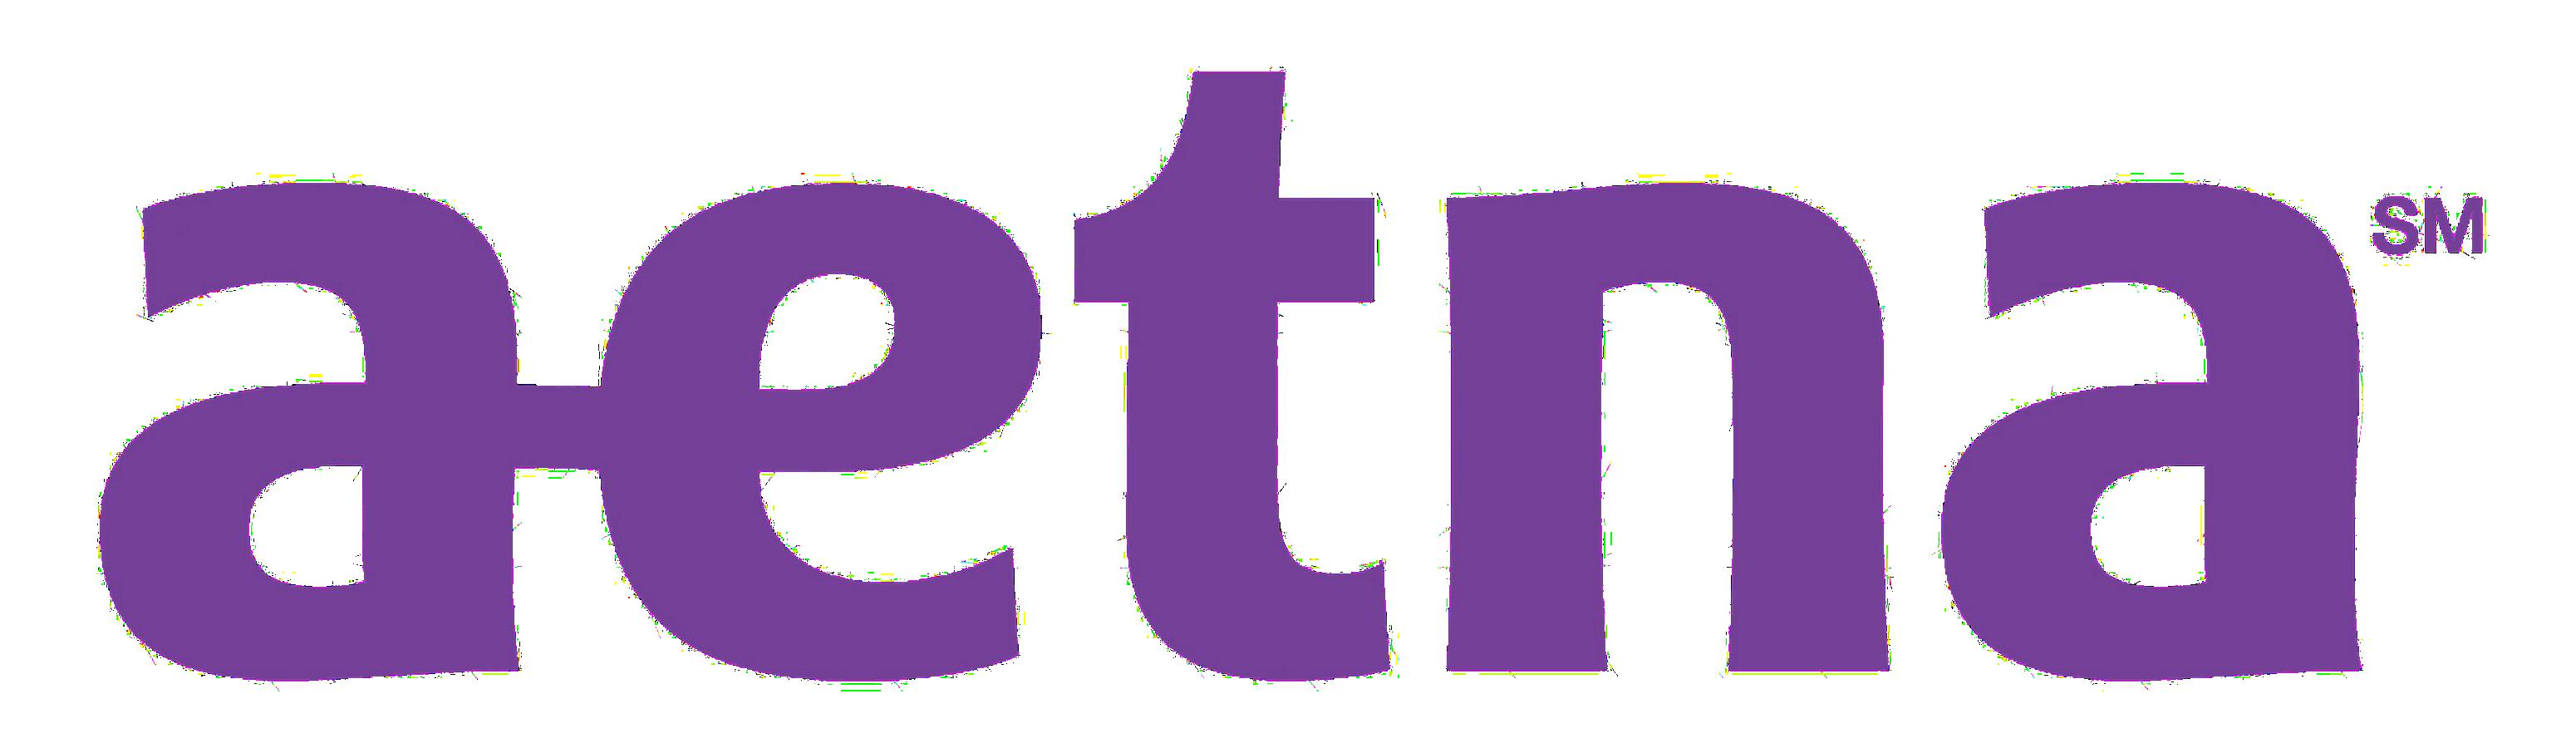 Aetna-Logo-PNG-Transparent-2